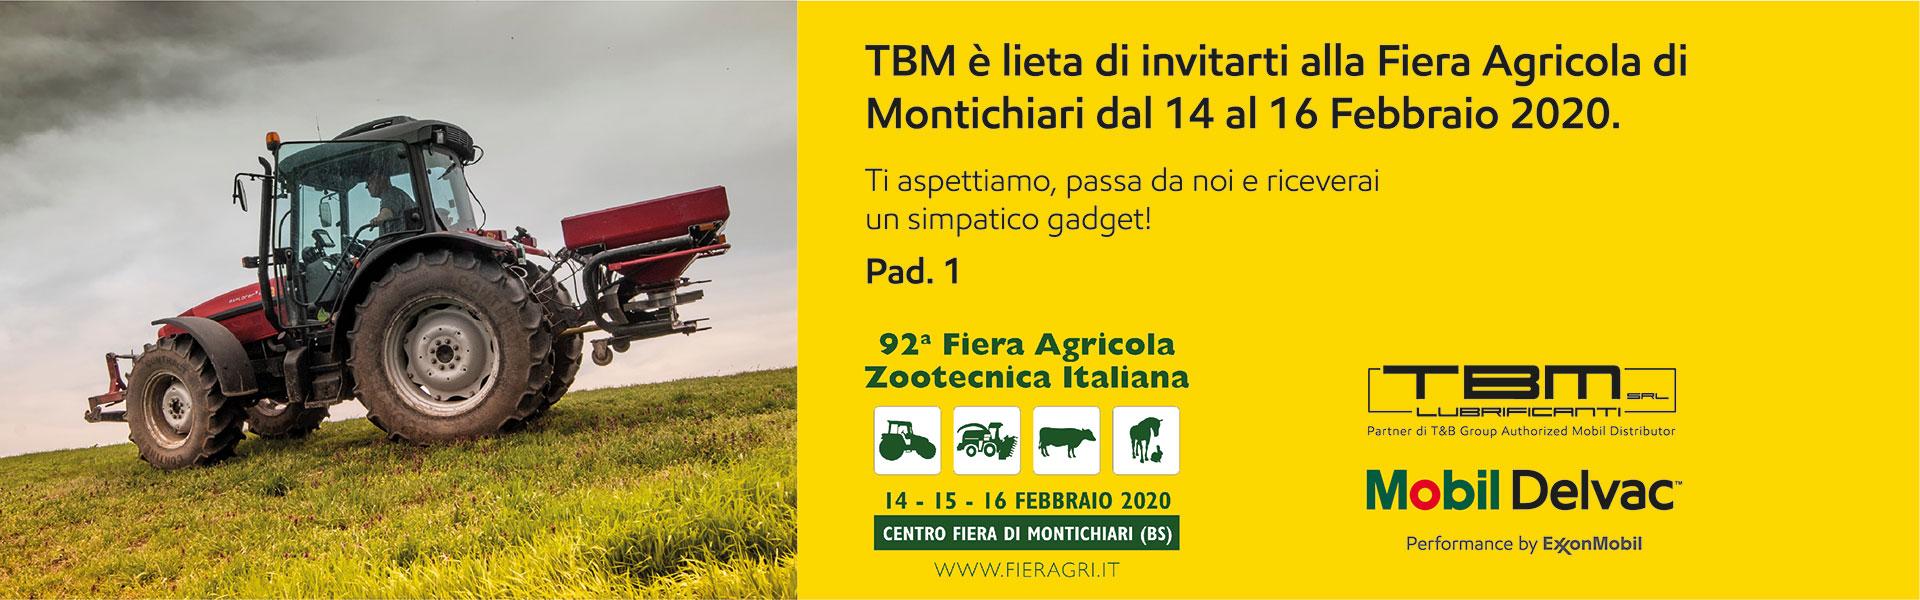 fiera_agricola_tbm_lubrificanti-1